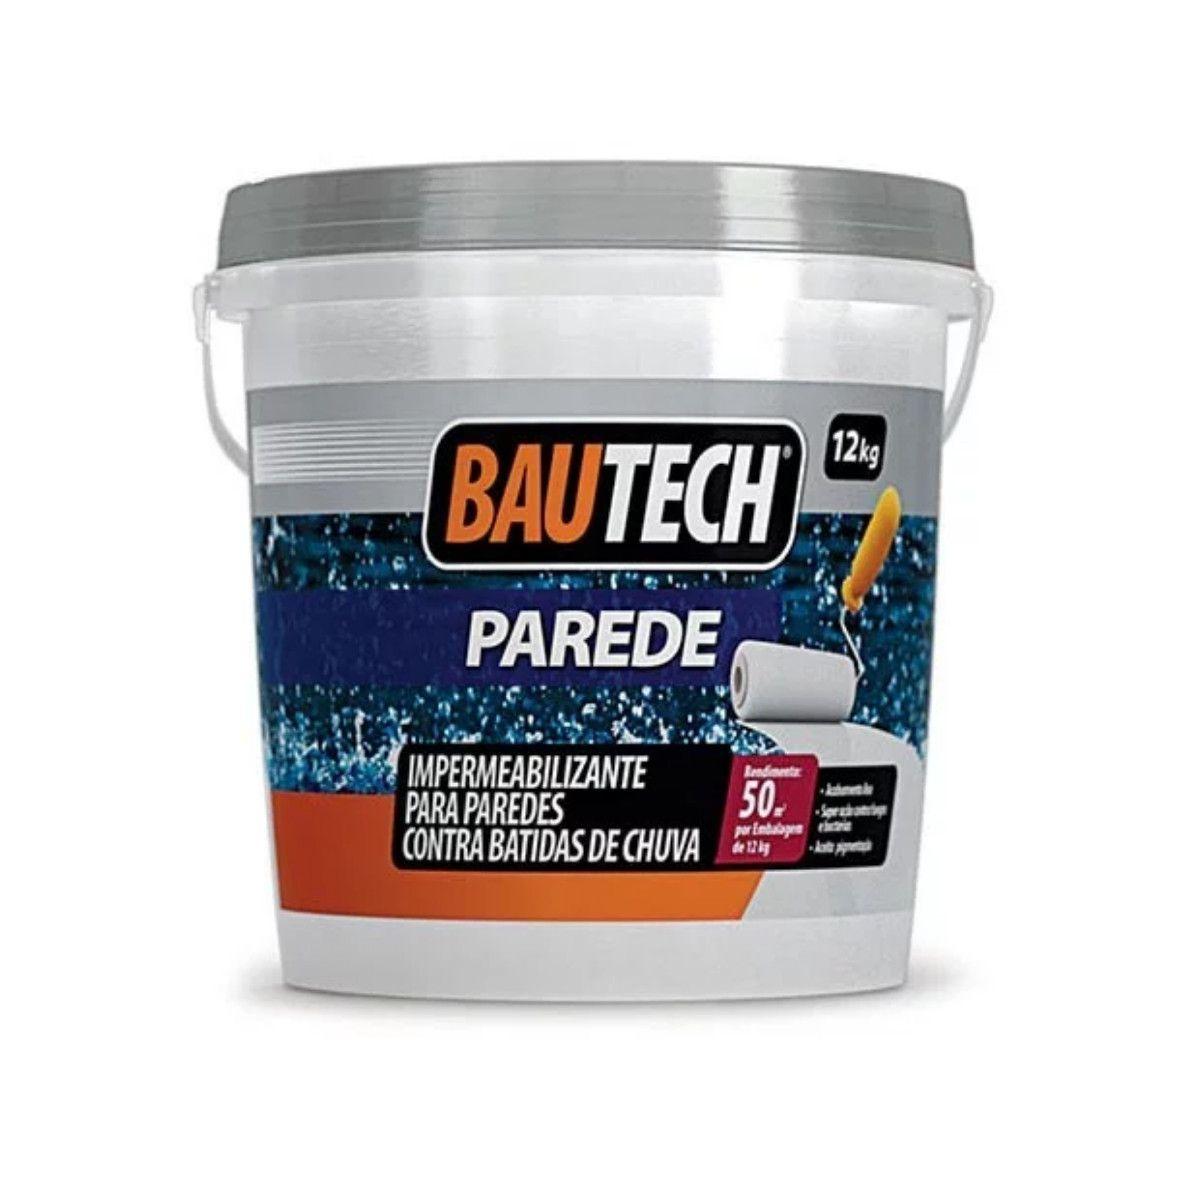 Bautech Parede Branco 12kg